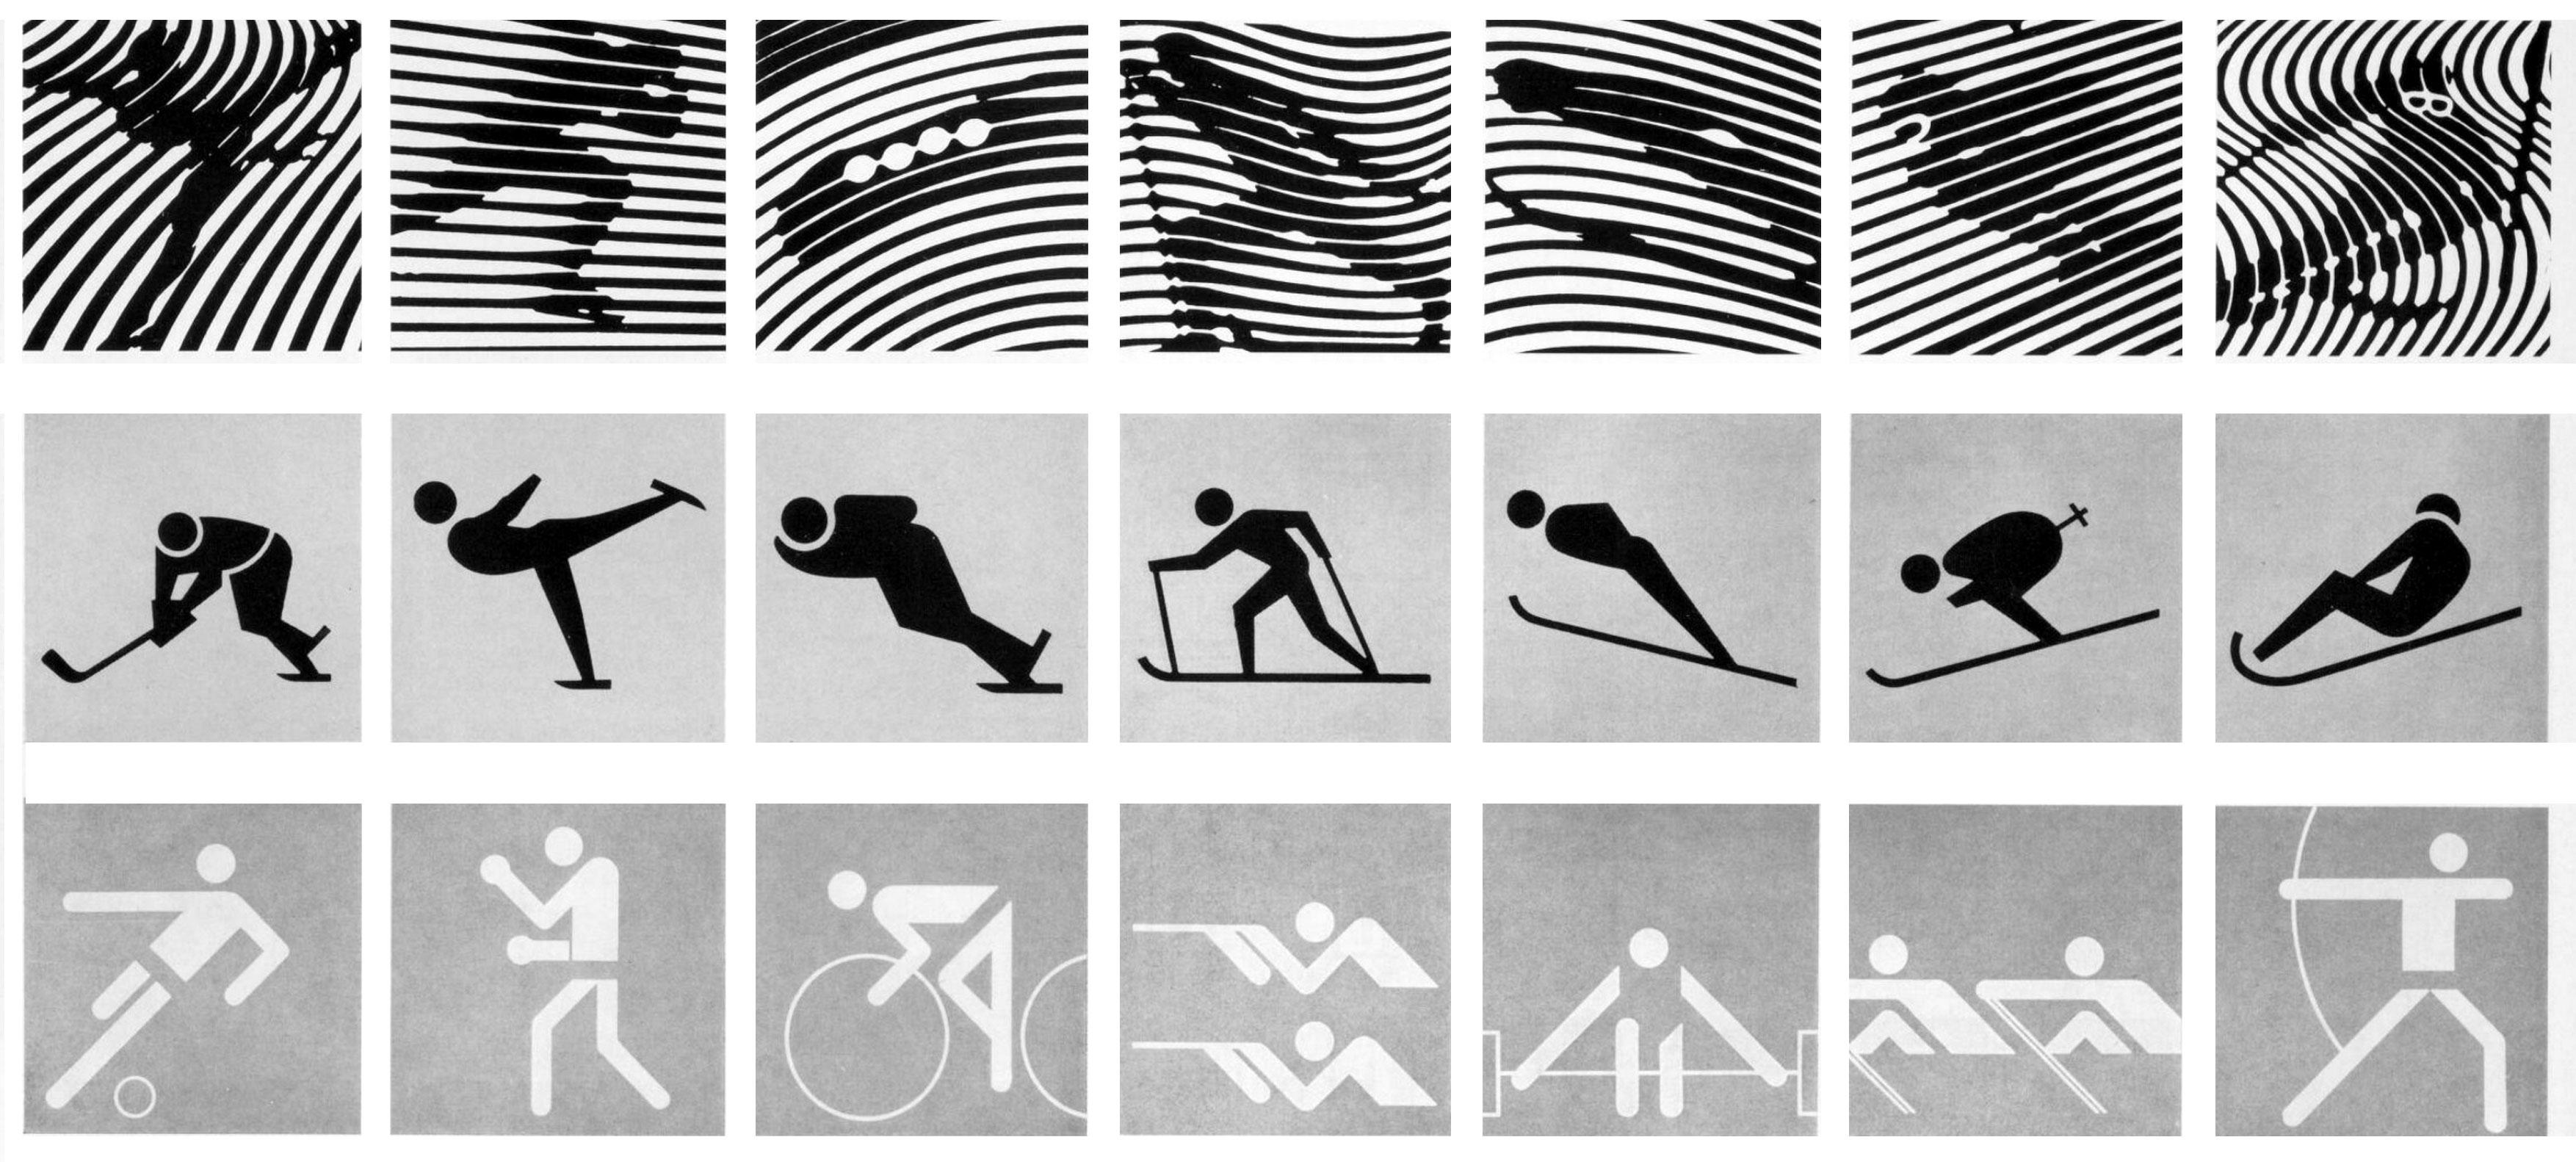 Pictogramme-Jeux-Olympiques-Aicher-Excoffon